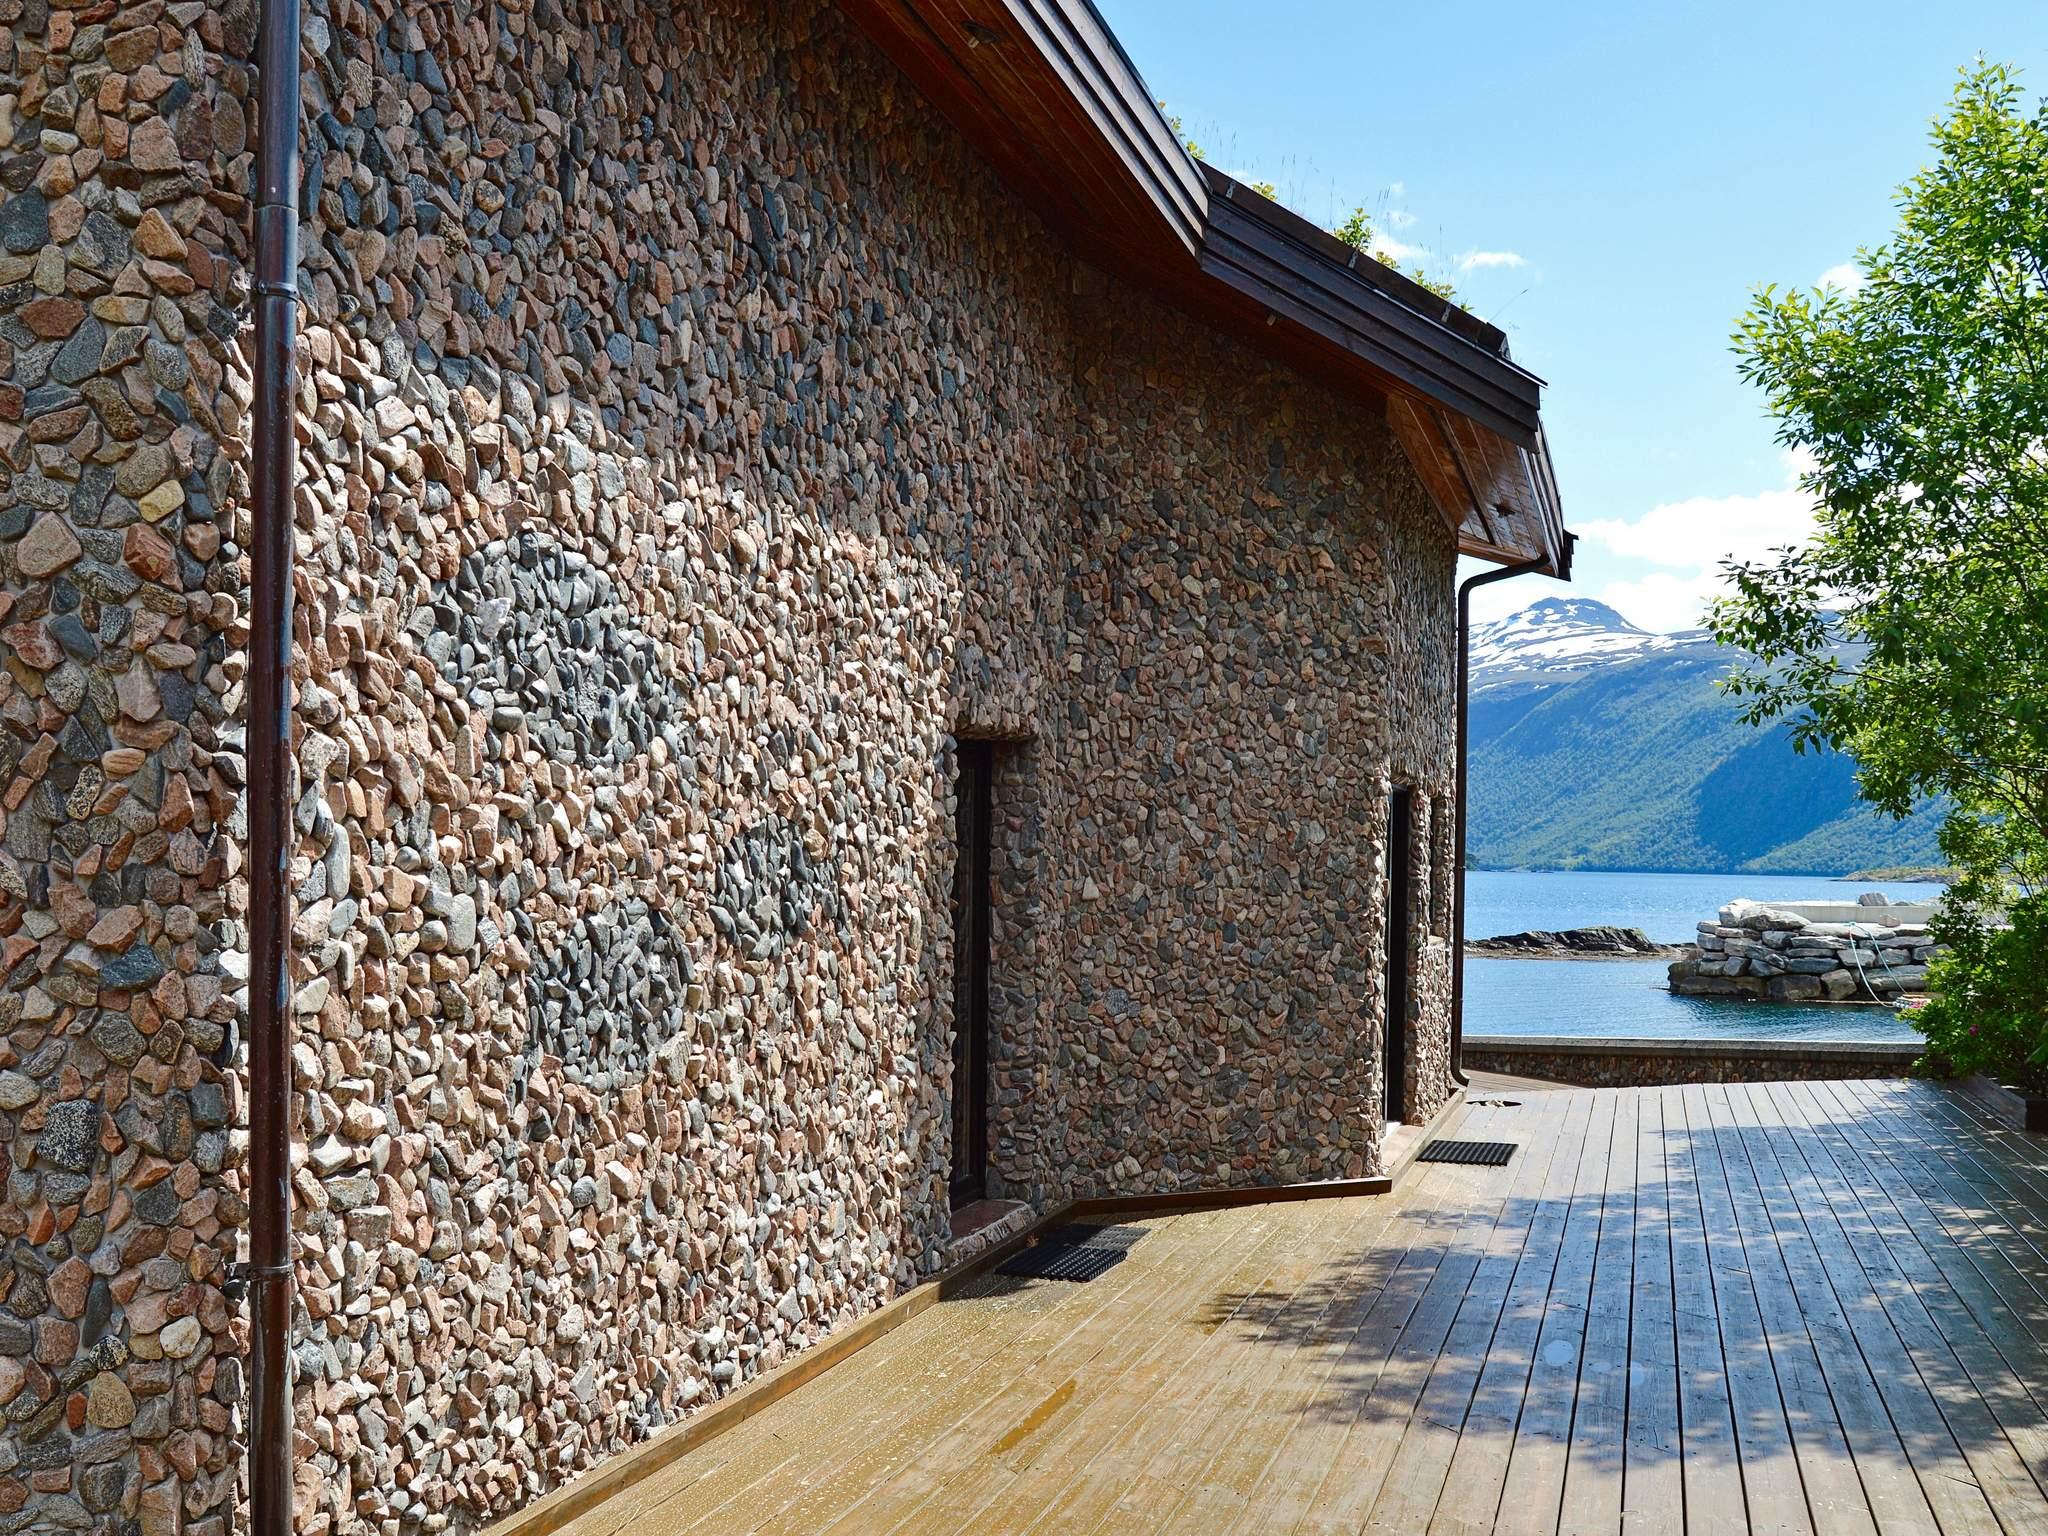 Ferienhaus Eidsvåg (84695), Eidsvåg, More - Romsdal, Westnorwegen, Norwegen, Bild 27